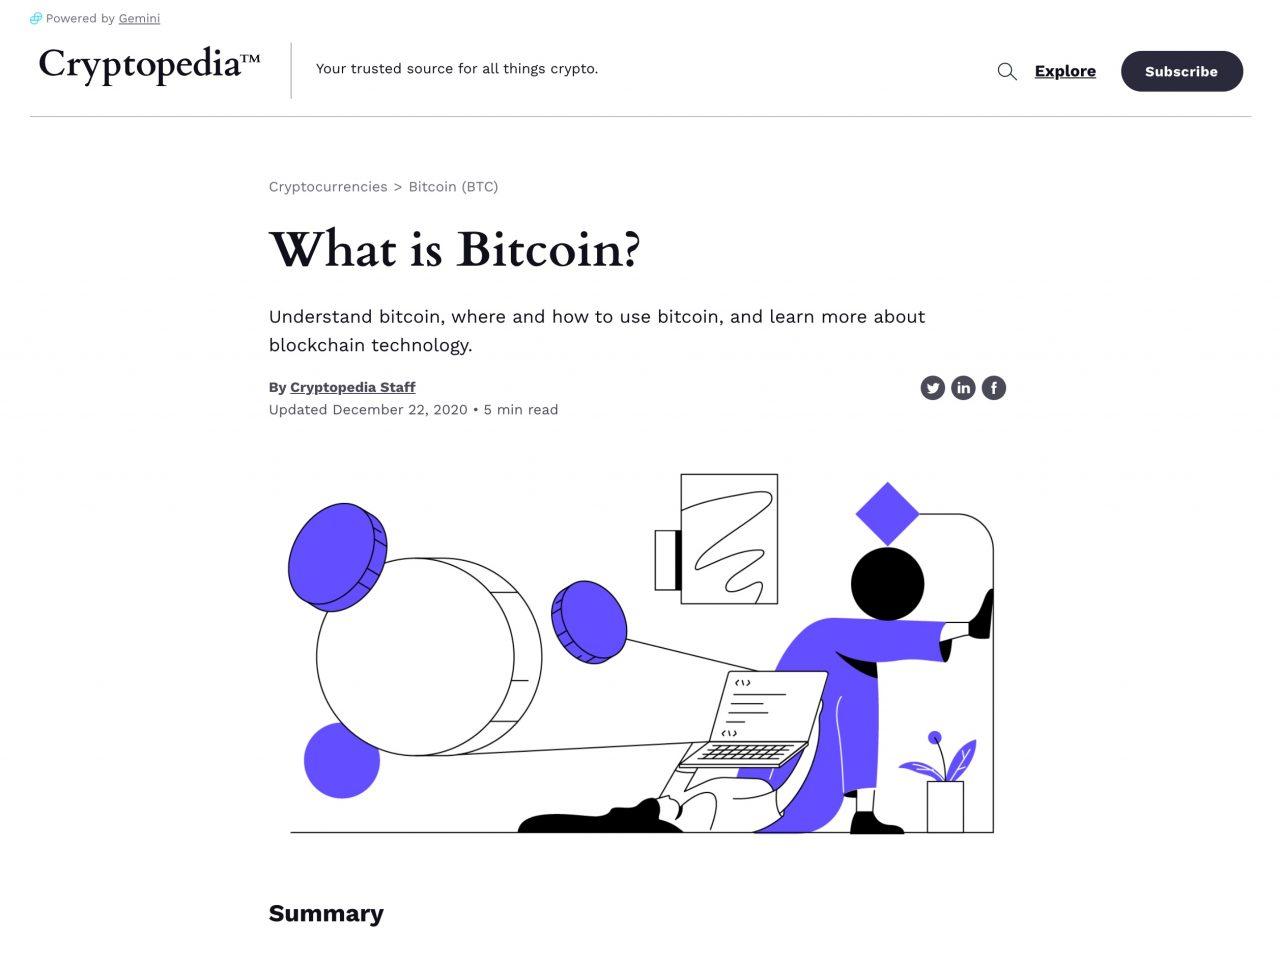 https://goodkarma.capital/wp-content/uploads/2021/06/Cryptopedia-1280x960.jpg